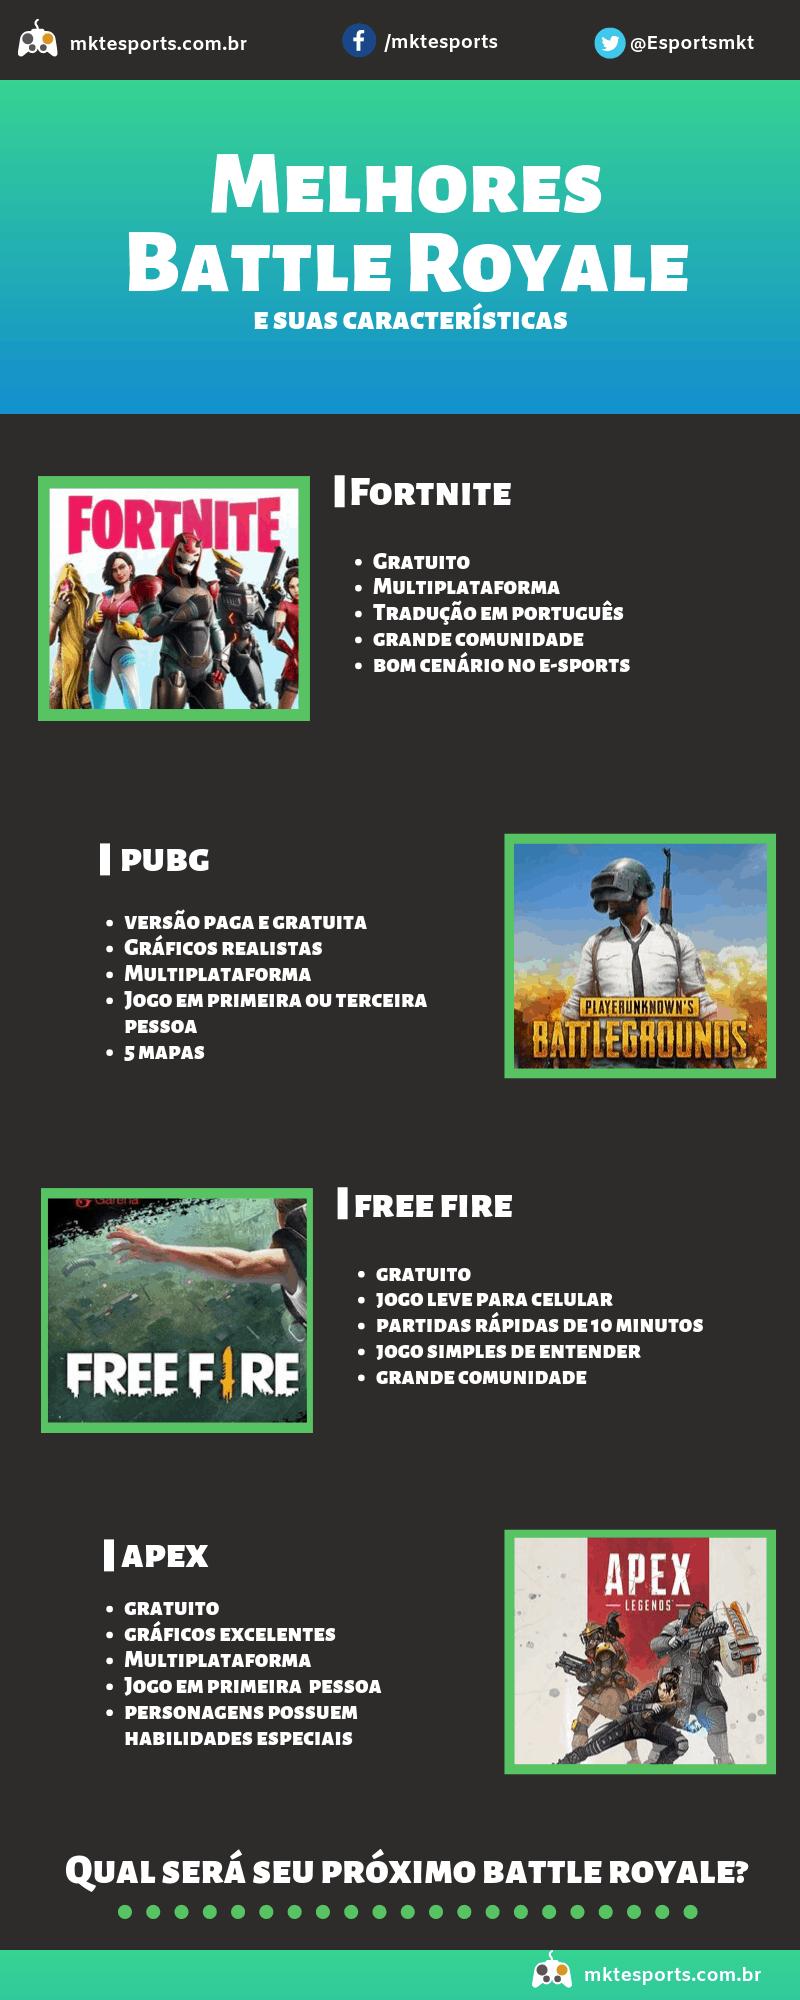 melhores-battle-royale-infografico